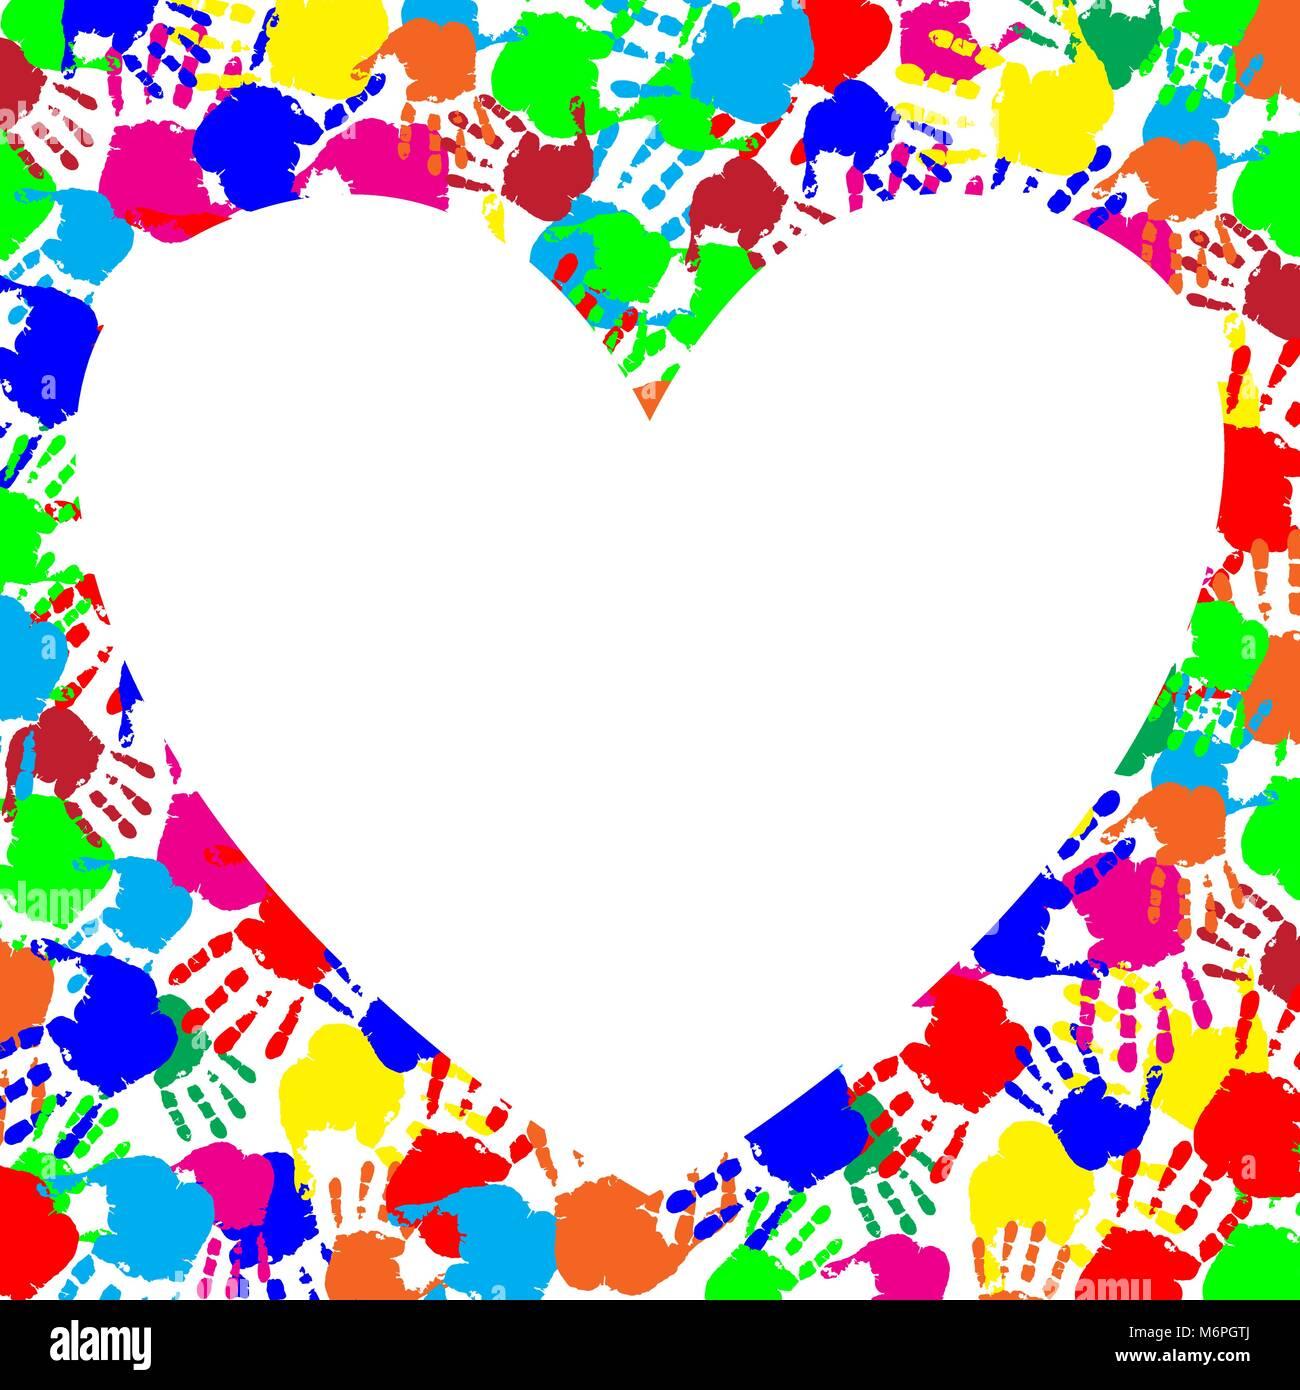 Heart Shape Photo Frames Stockfotos & Heart Shape Photo Frames ...